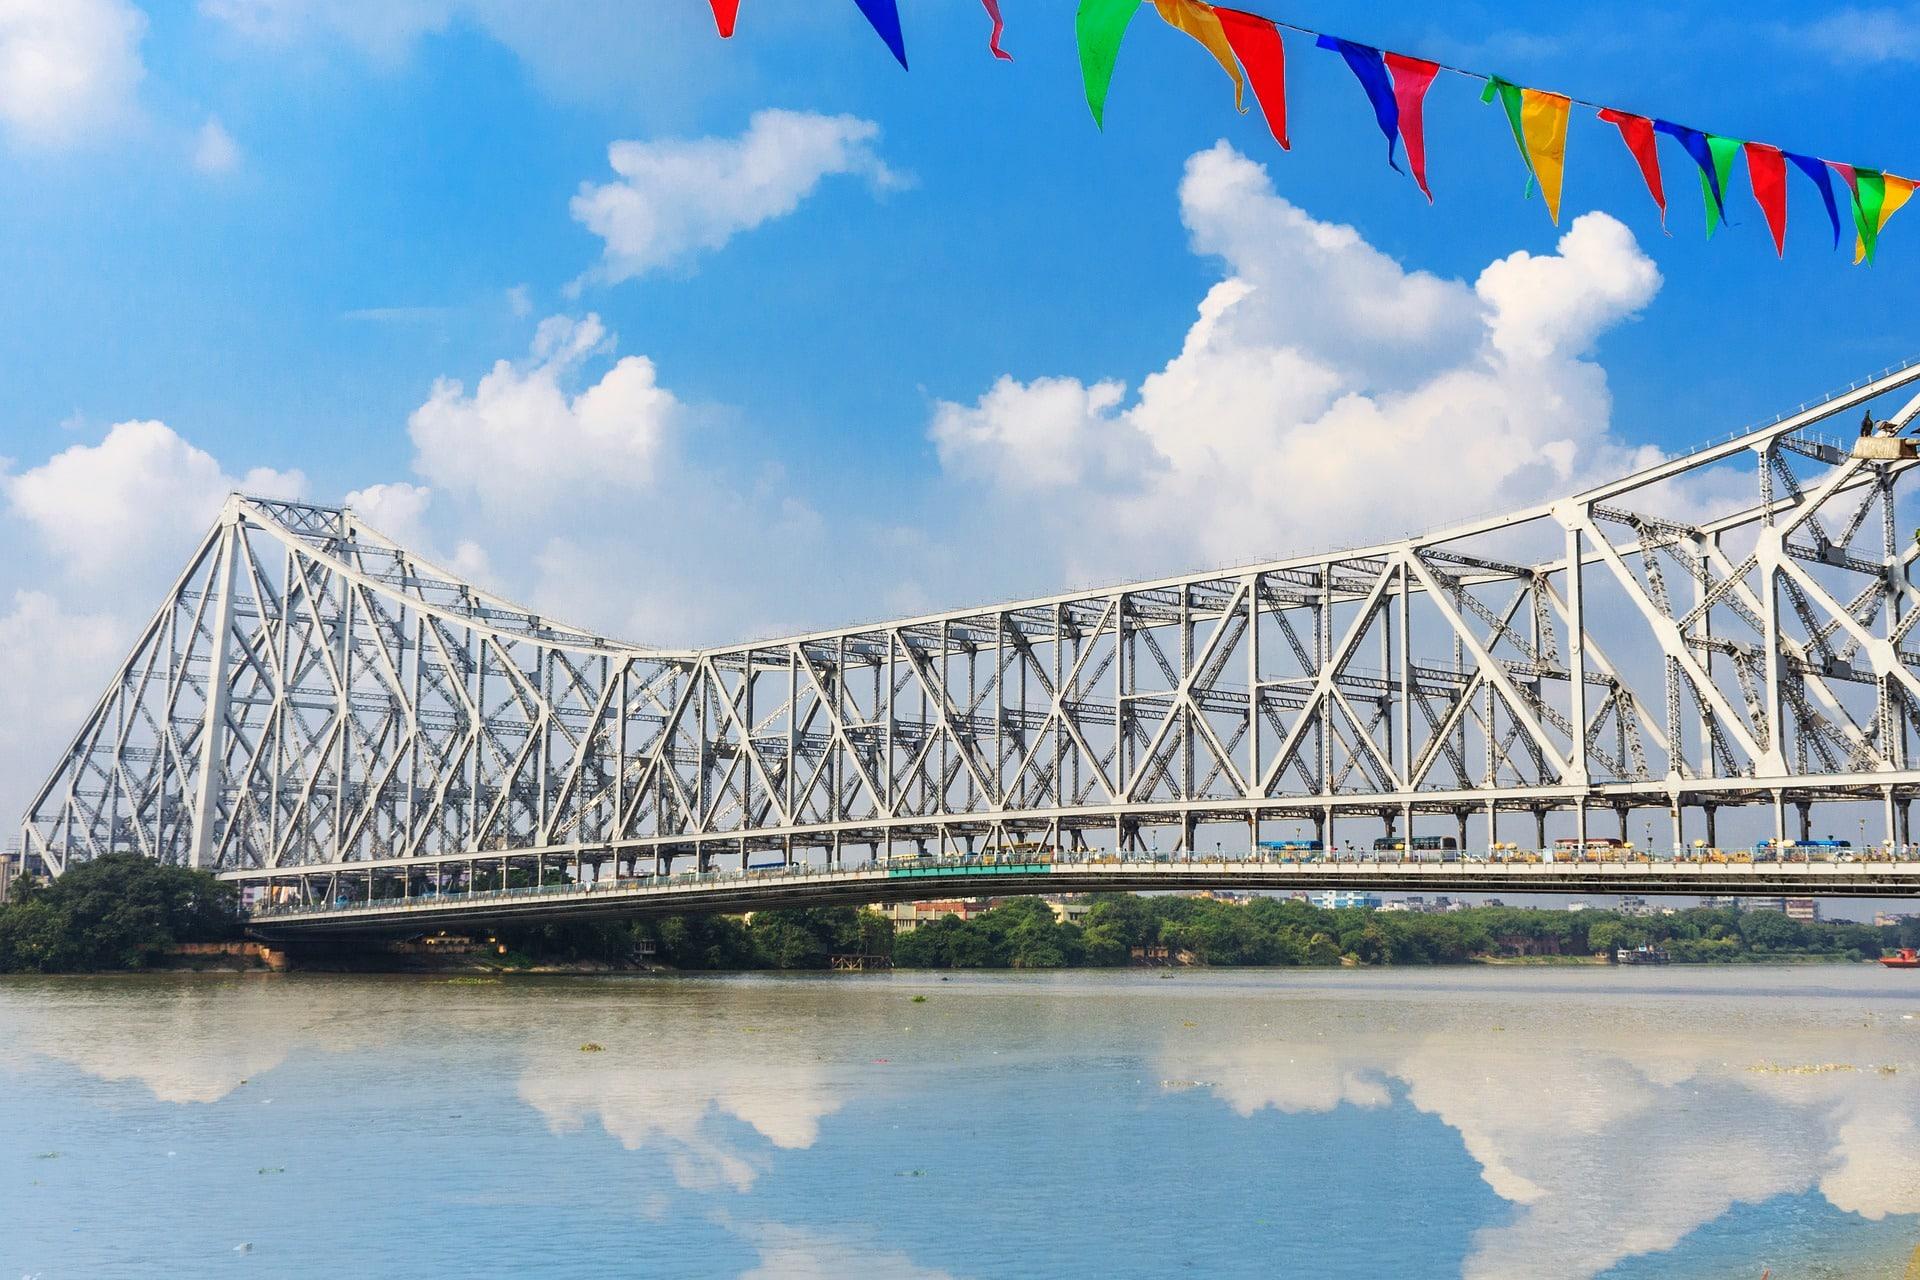 Odisha Temples & Sundarbans Delta 3